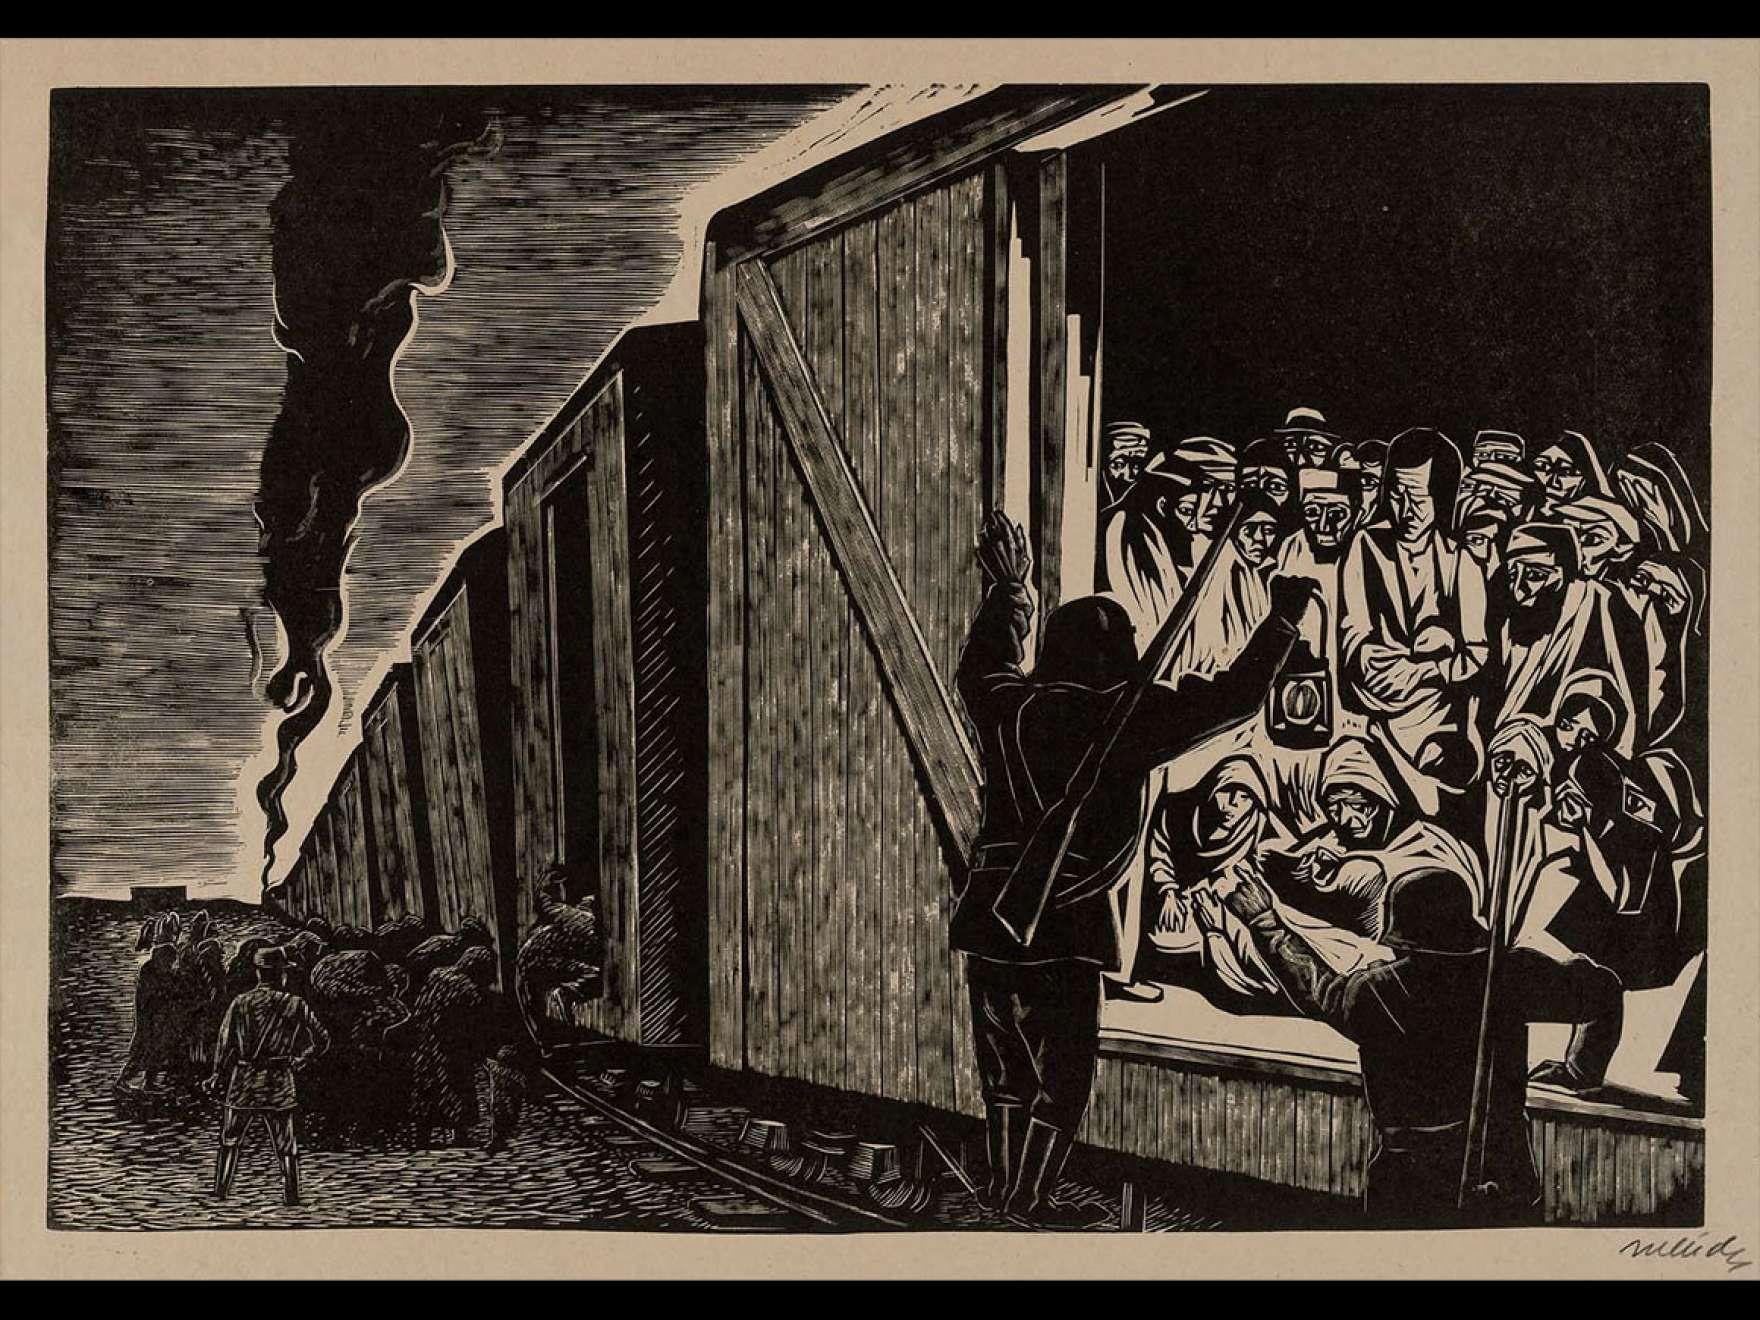 Leopoldo Méndez's Linocut piece, Deportation to Death (Deportacion a la muerte), 1942.